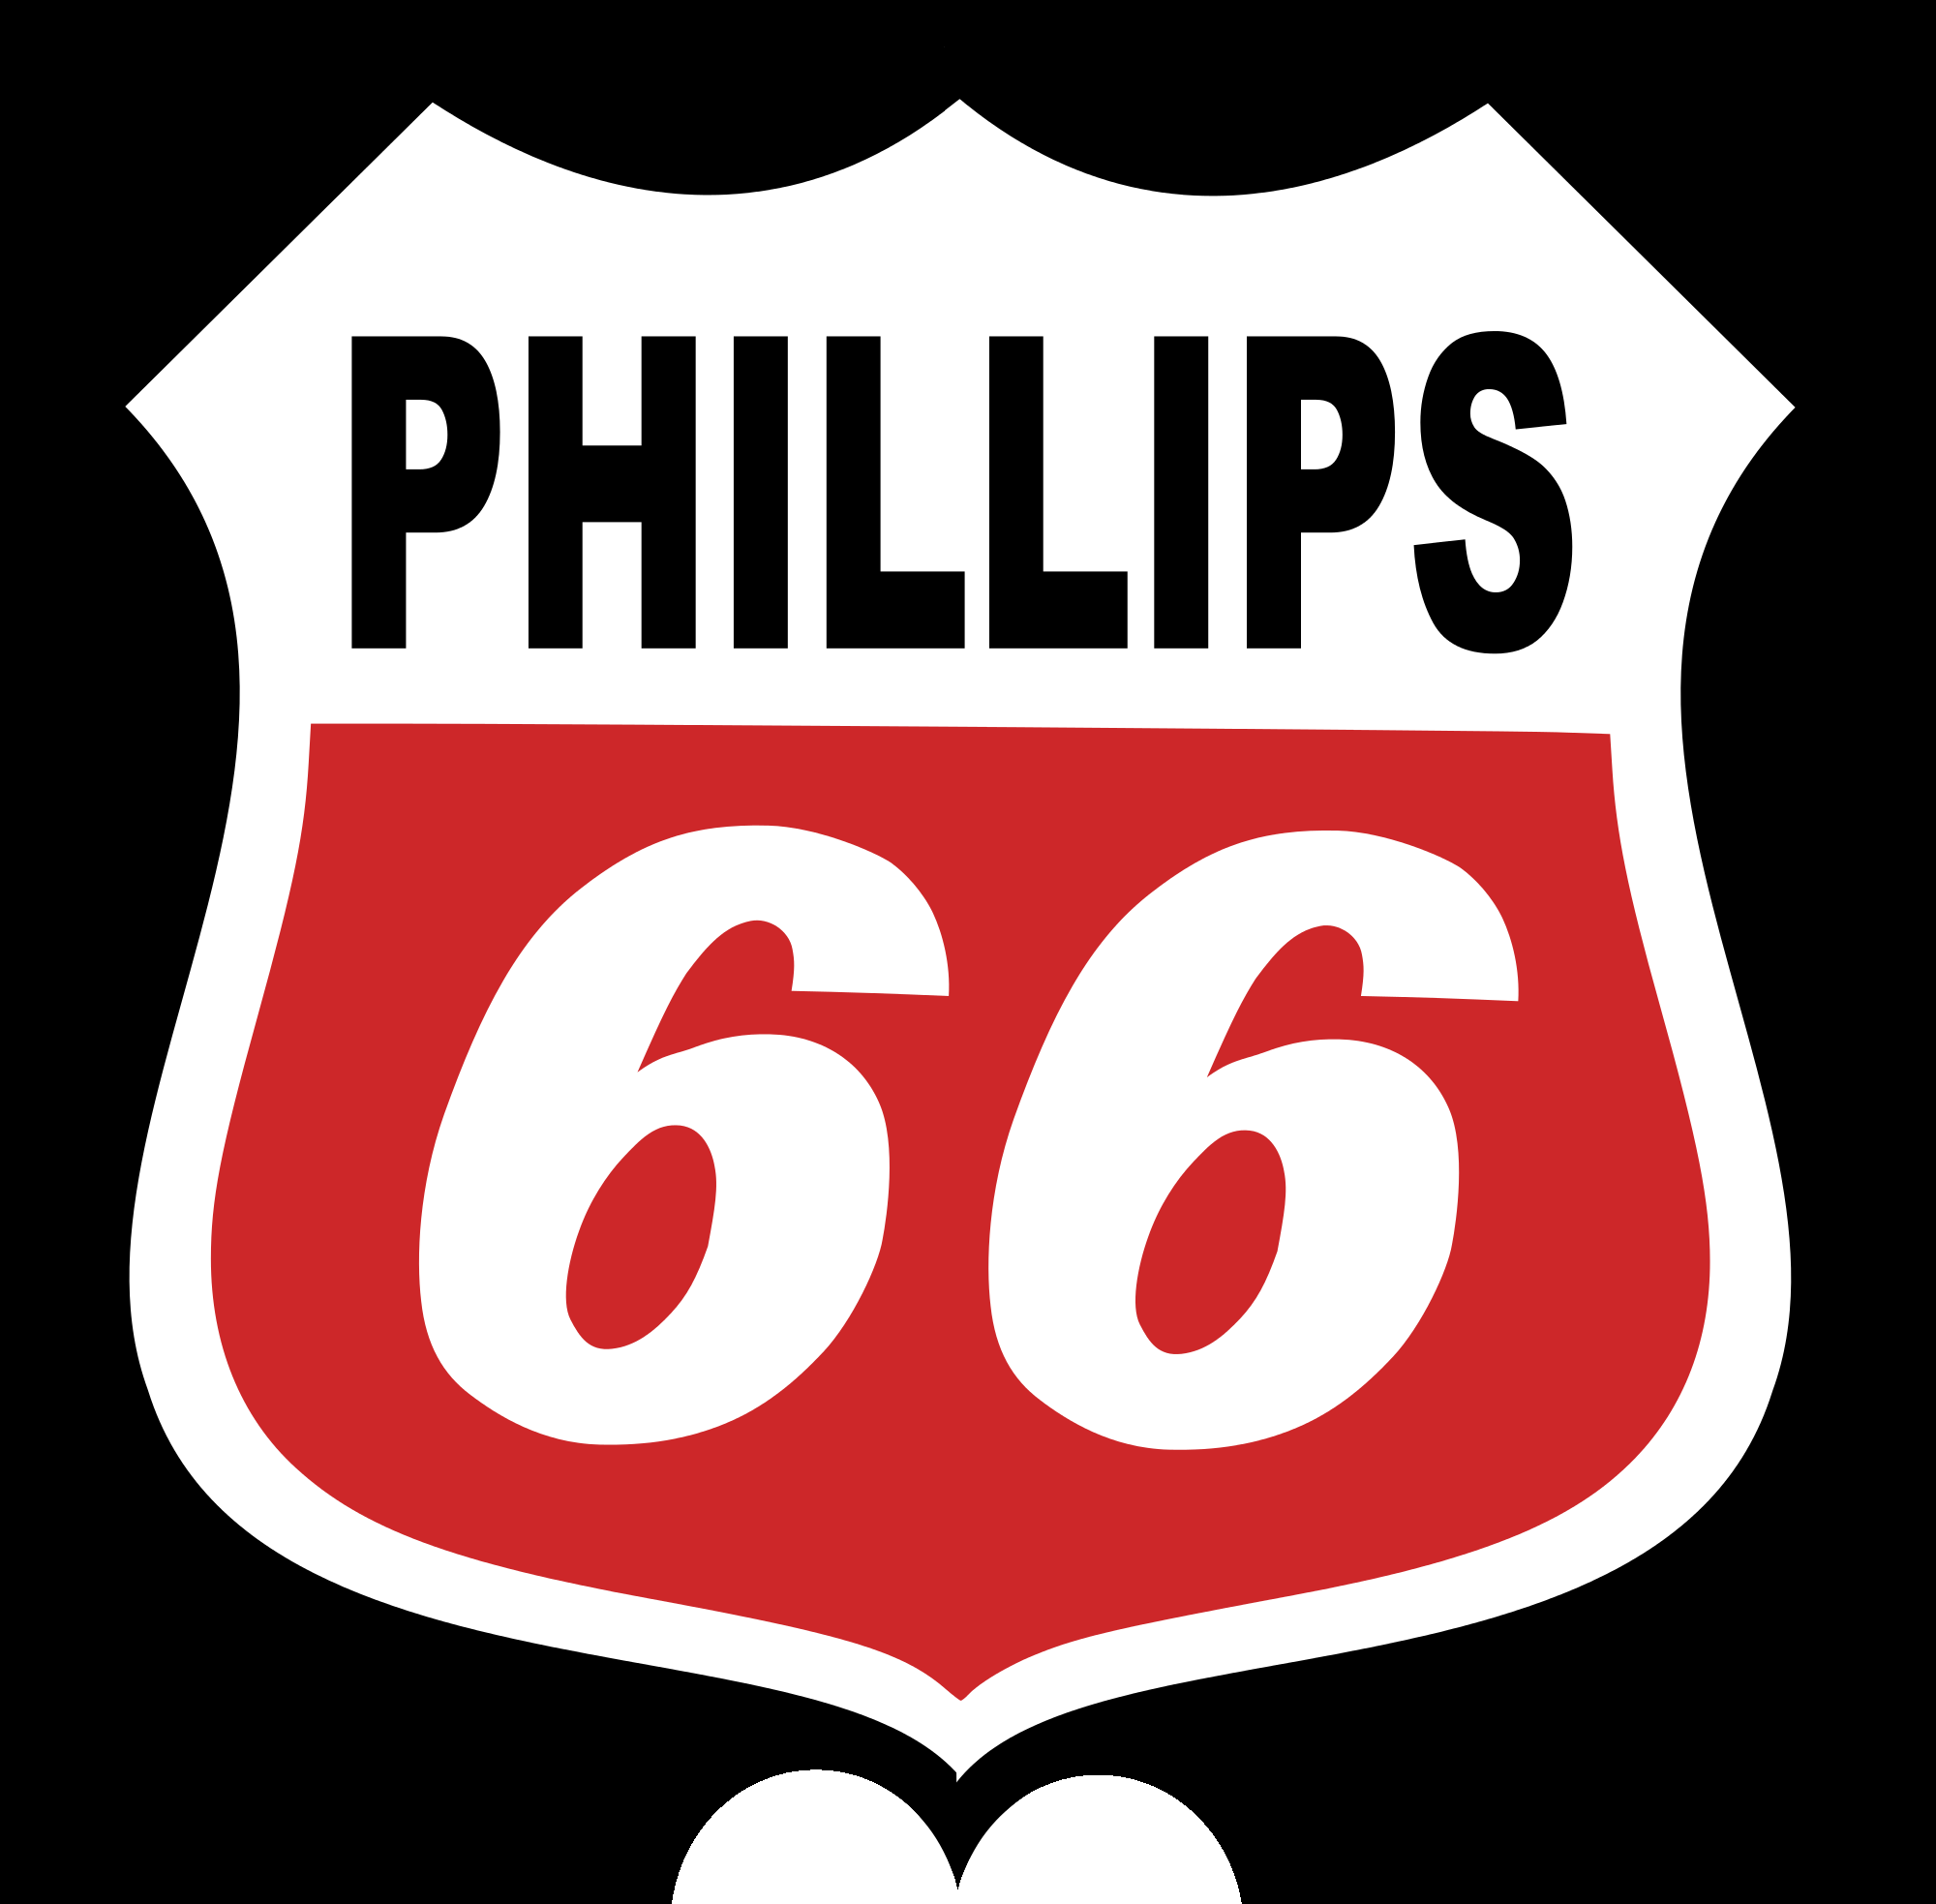 Phillips 66 Magnus Oil 46 Cross Reference